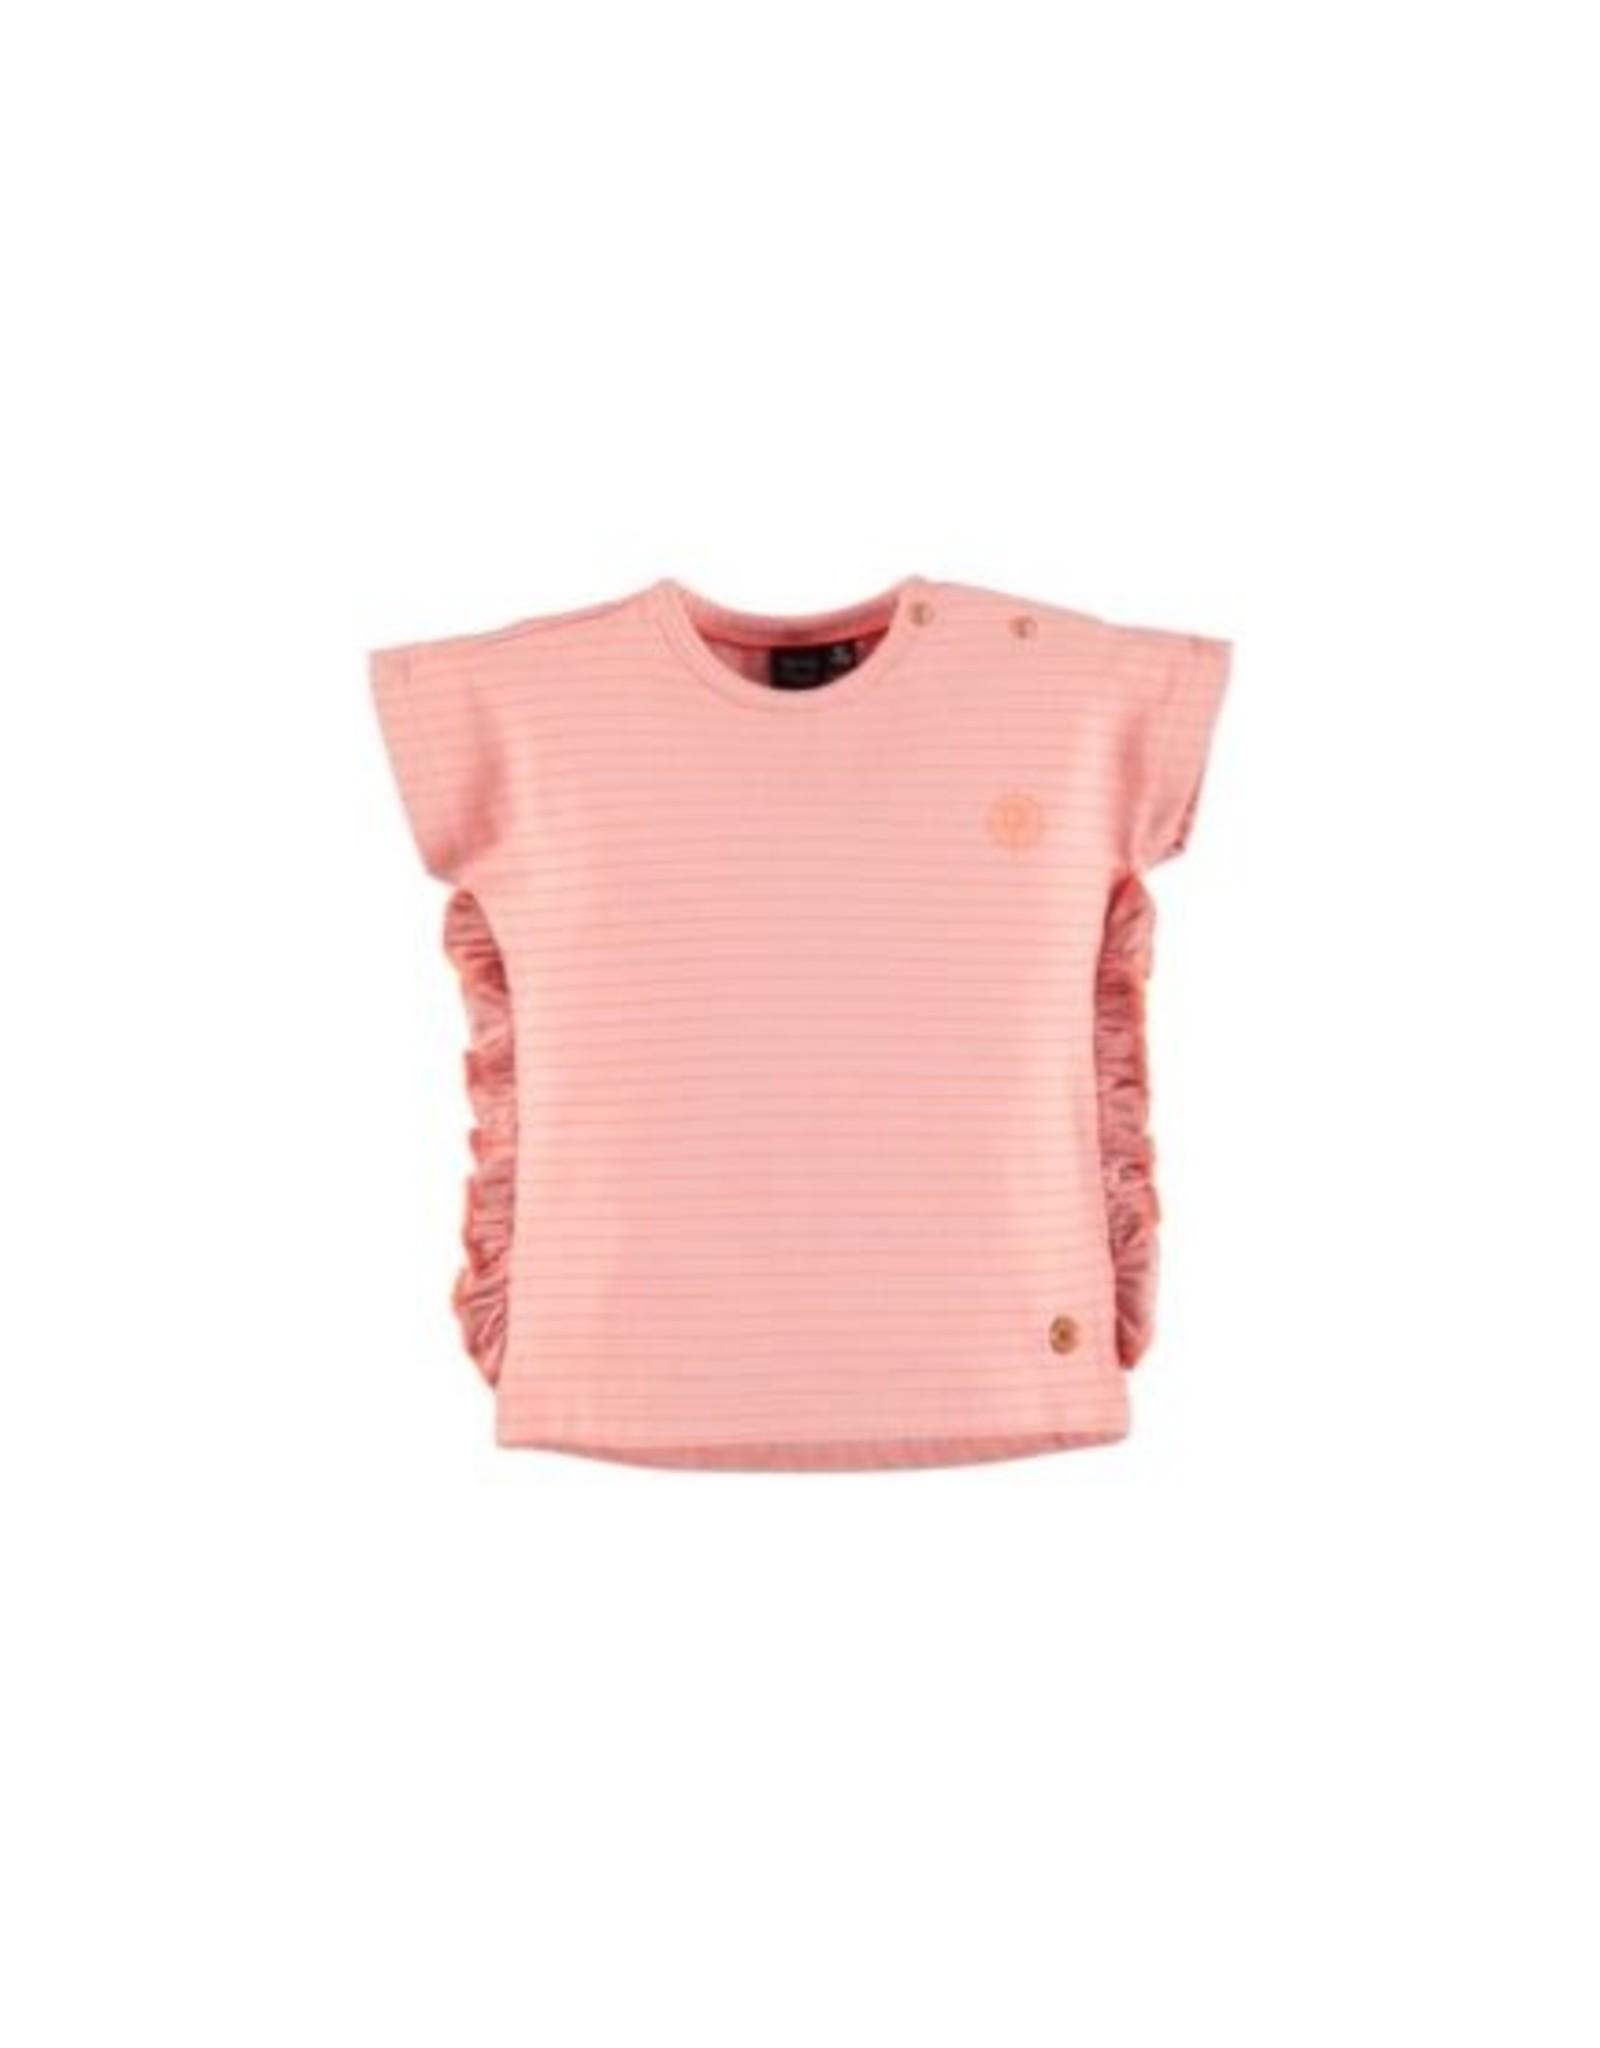 Babyface Girls t-shirt sh.sl. SWEET PINK